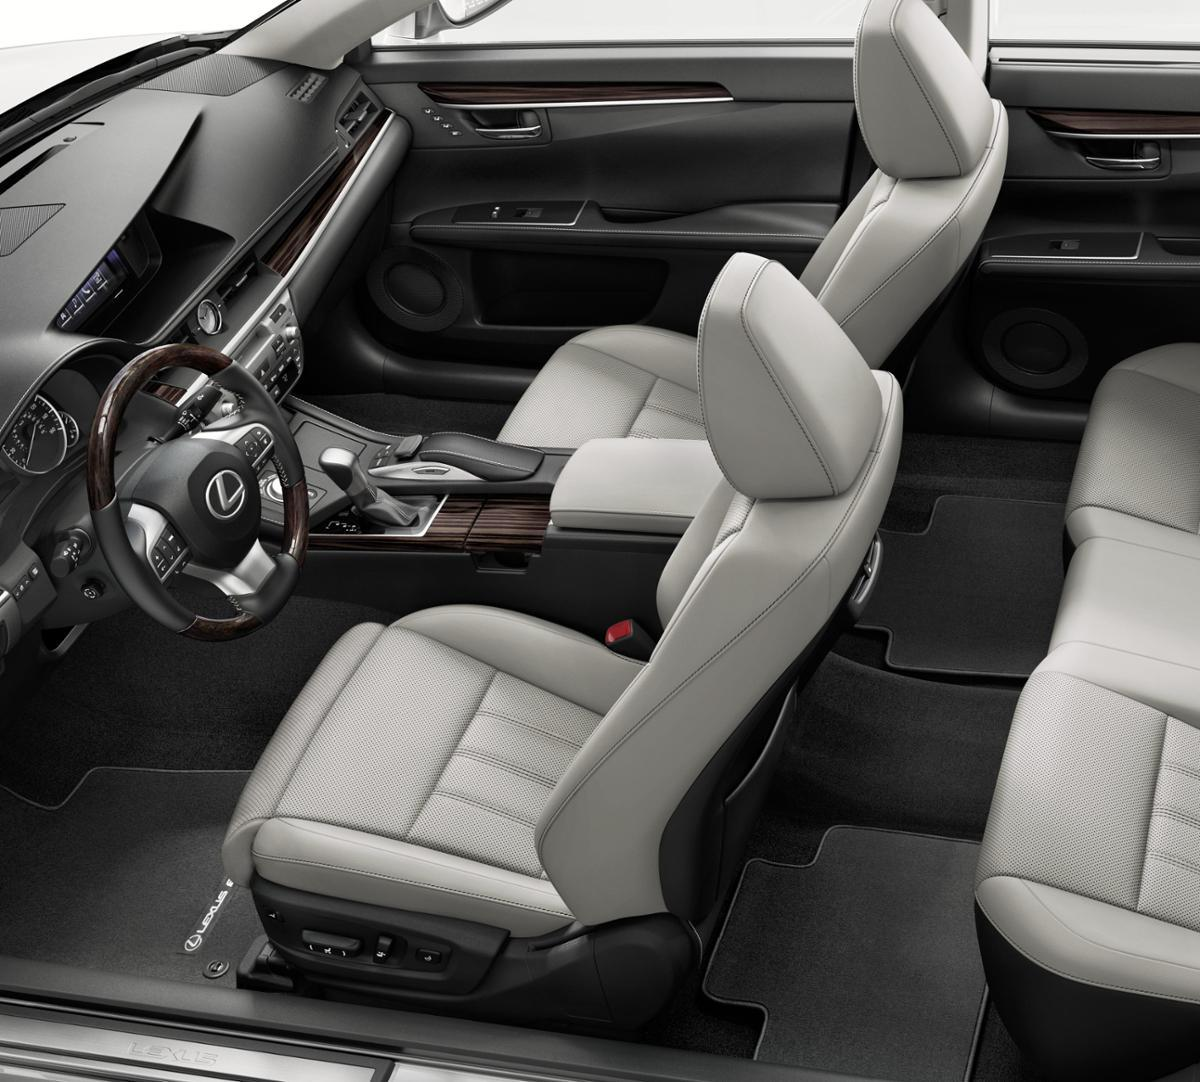 Dallas Certified 2018 Lexus ES 350 Nebula Gray Pearl: Car